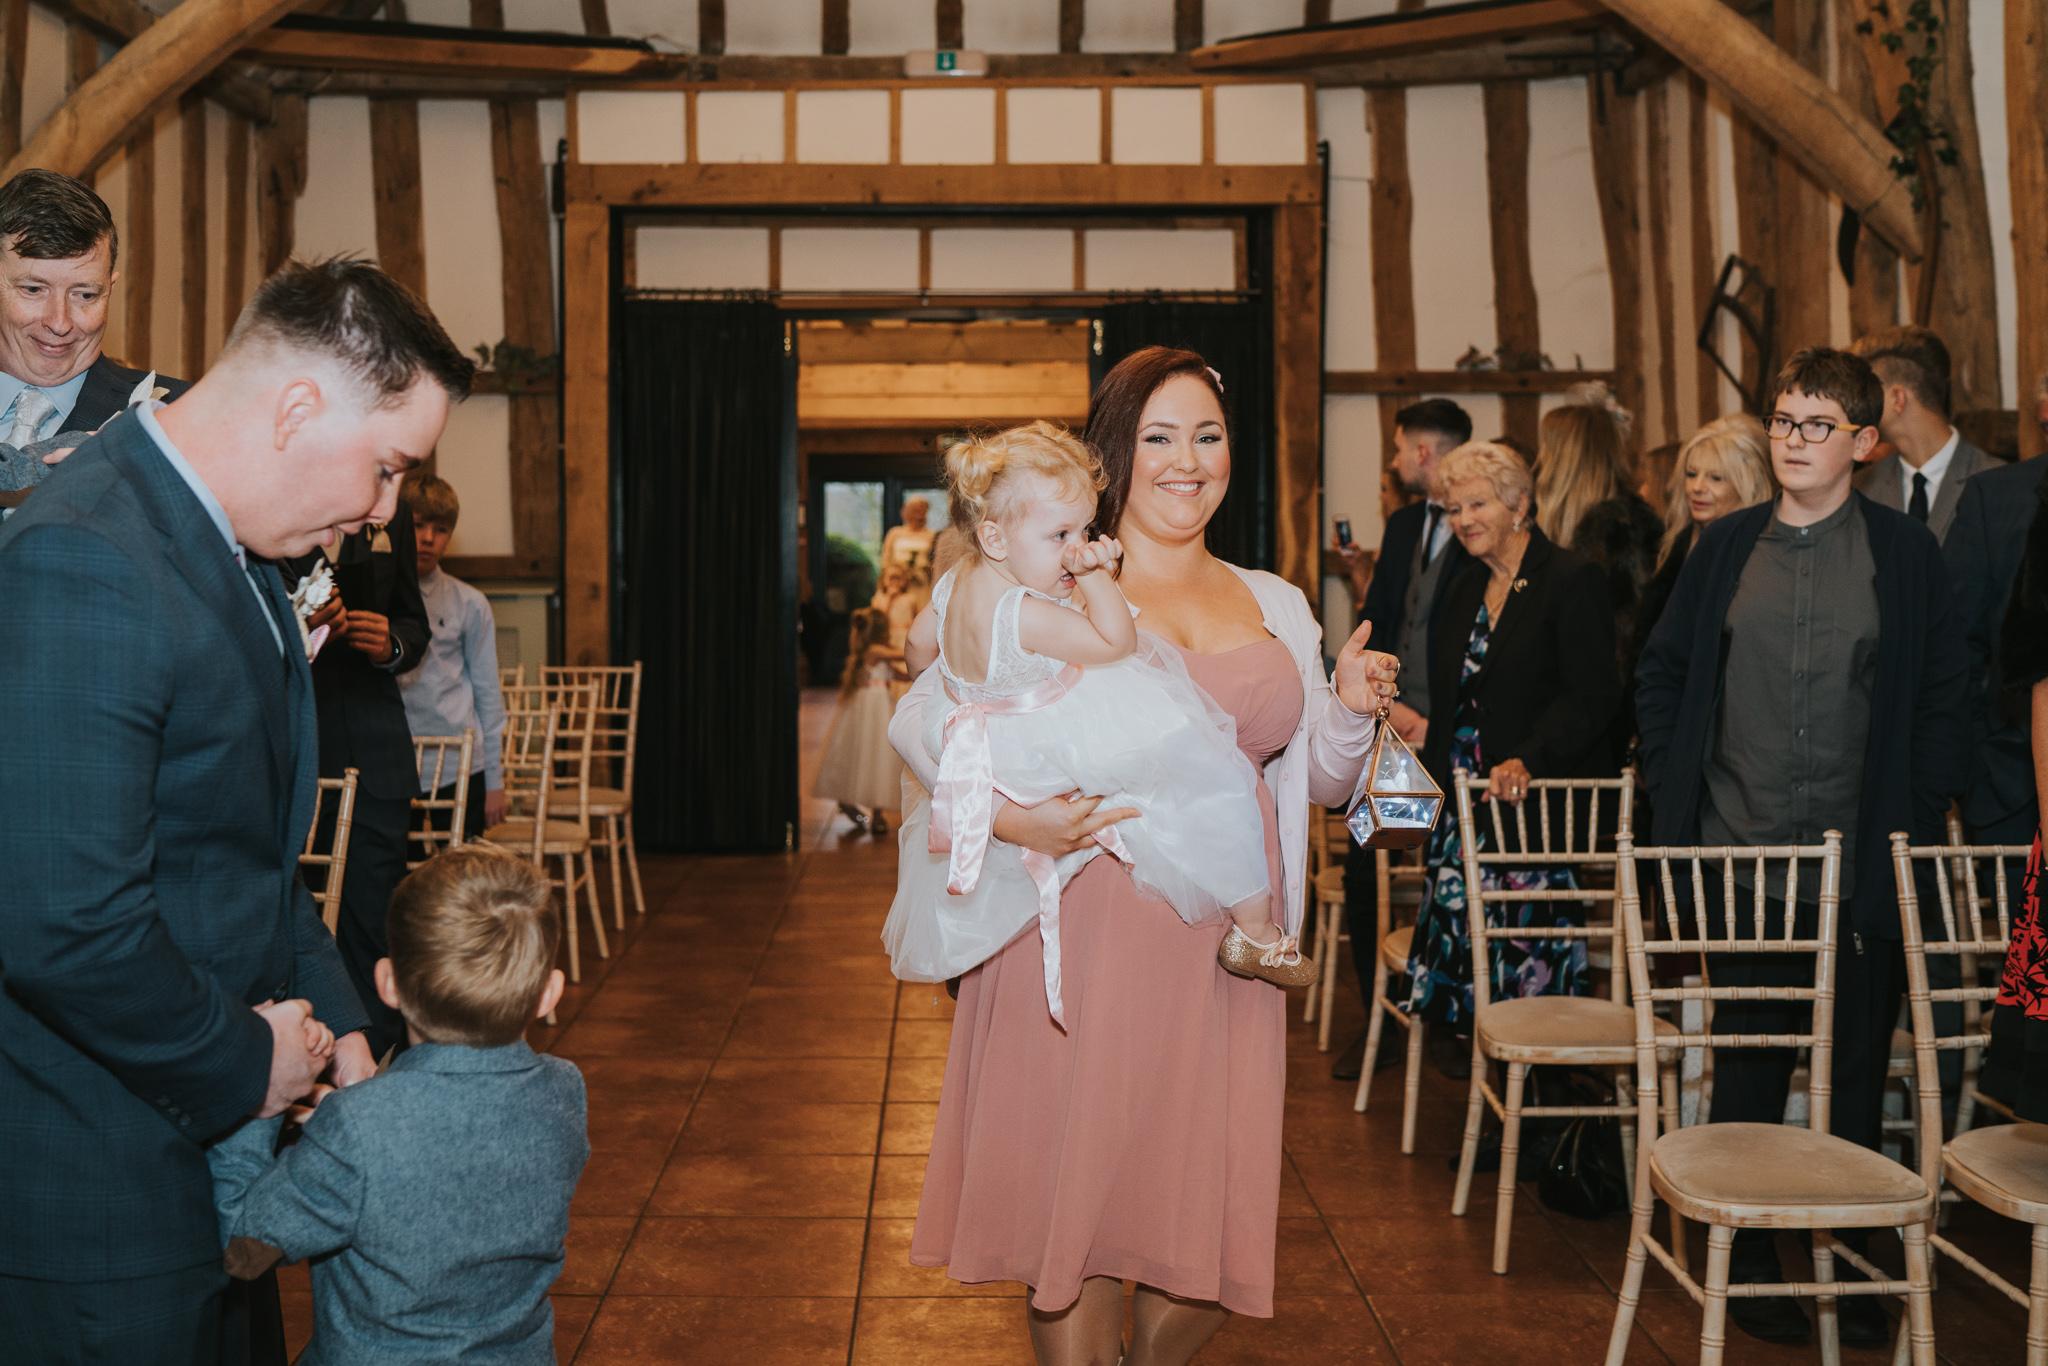 rhia-james-rustic-crabbs-barn-vintage-50s-retro-wedding-grace-elizabeth-colchester-essex-alternative-relaxed-wedding-family-photography-devon-suffolk-norfolk-essex (65 of 138).jpg